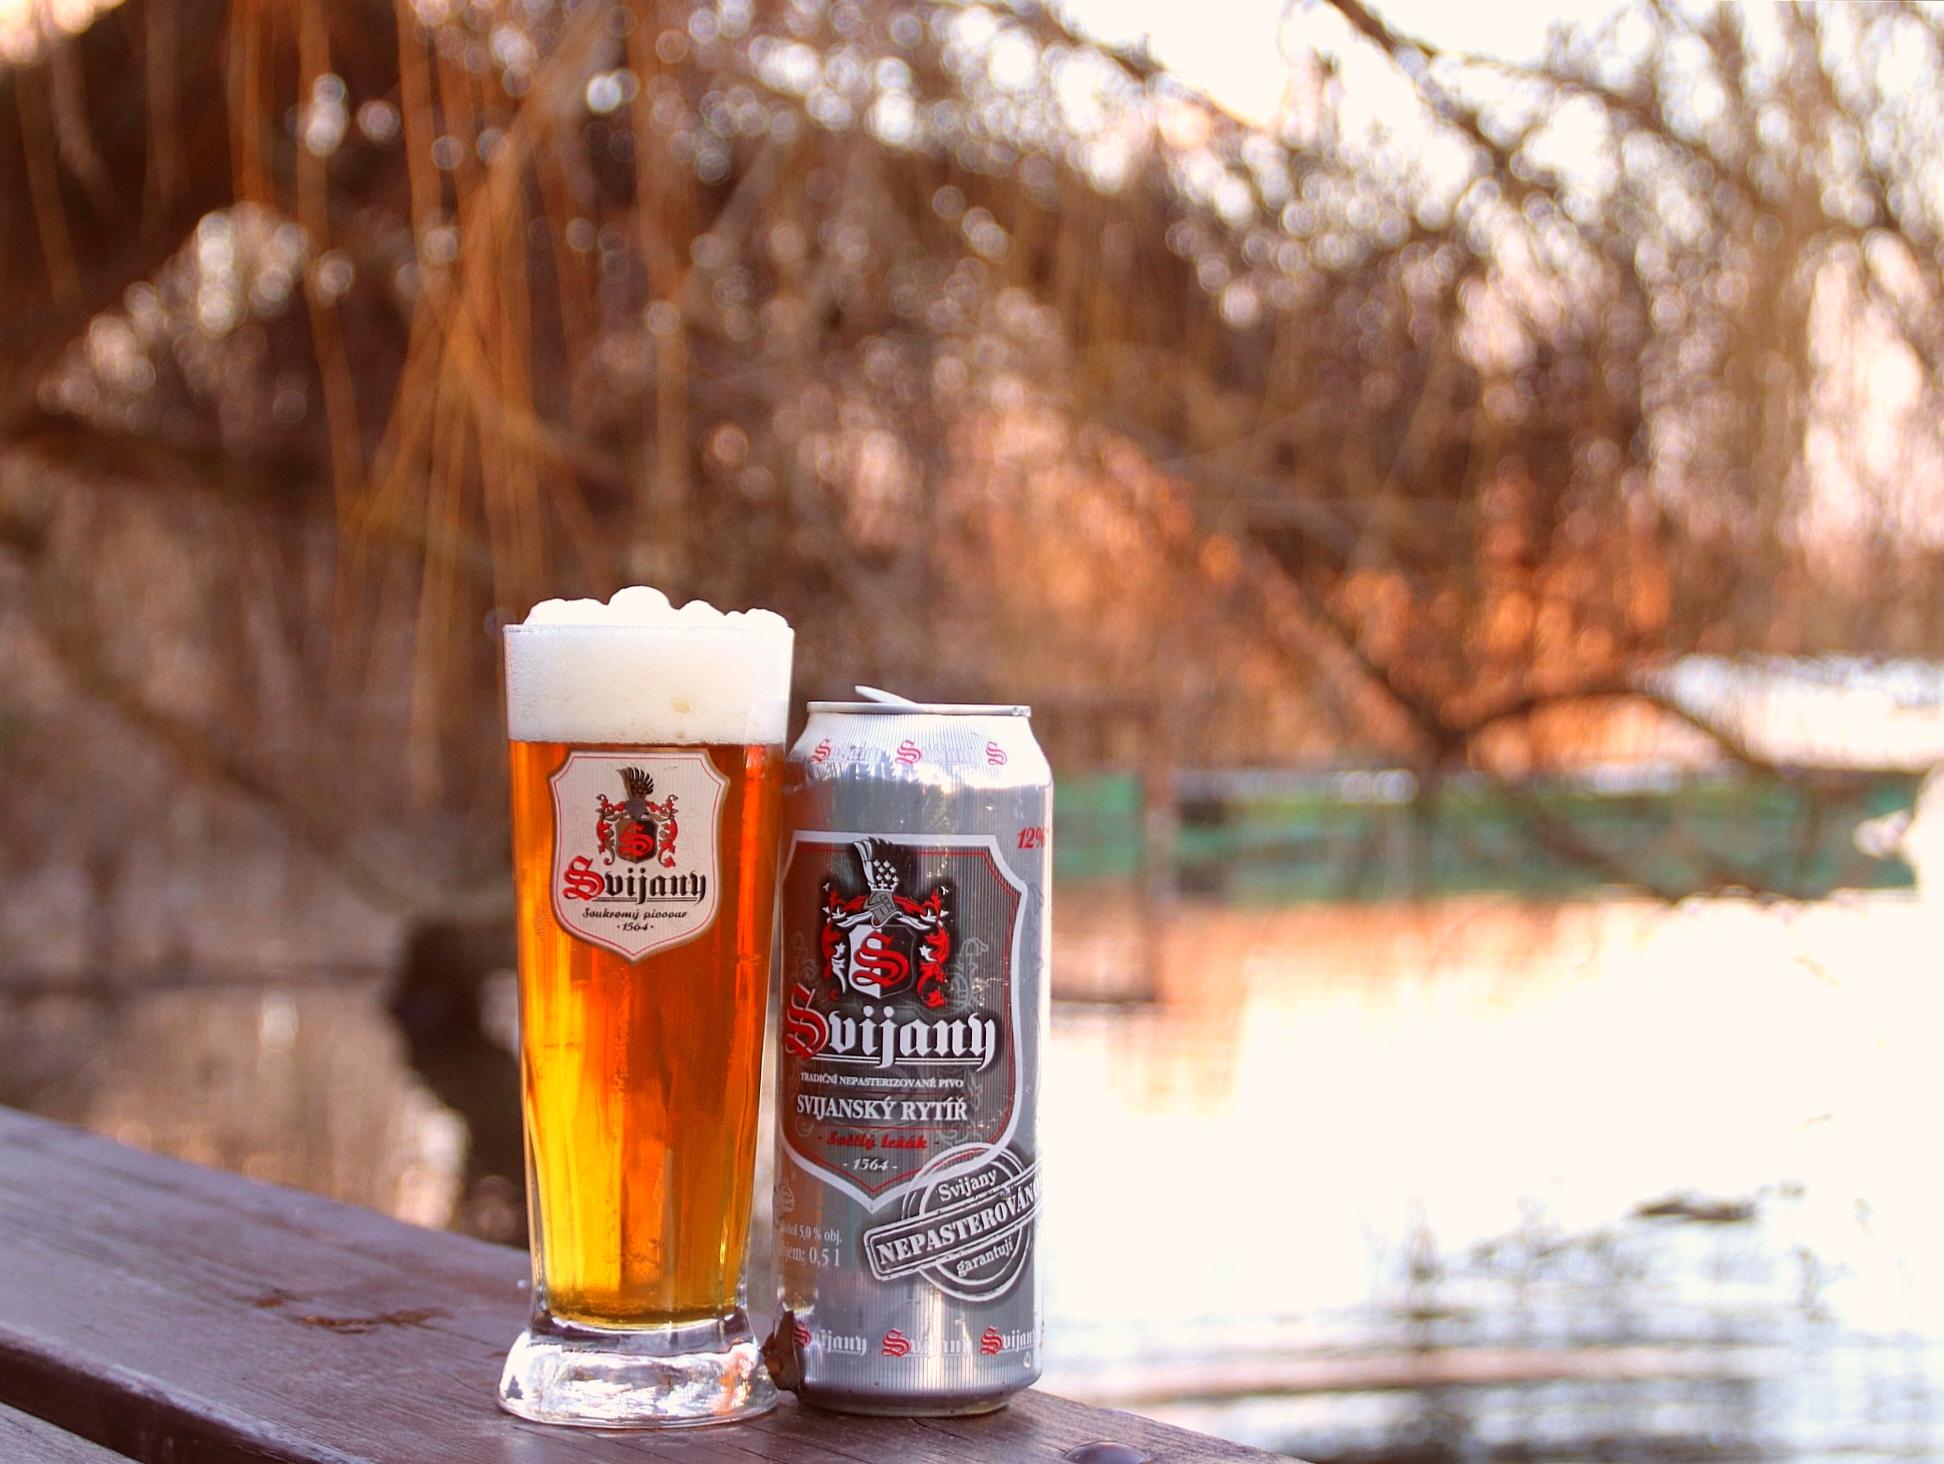 Kedvenc cseh sör - Svijansky Rytíř